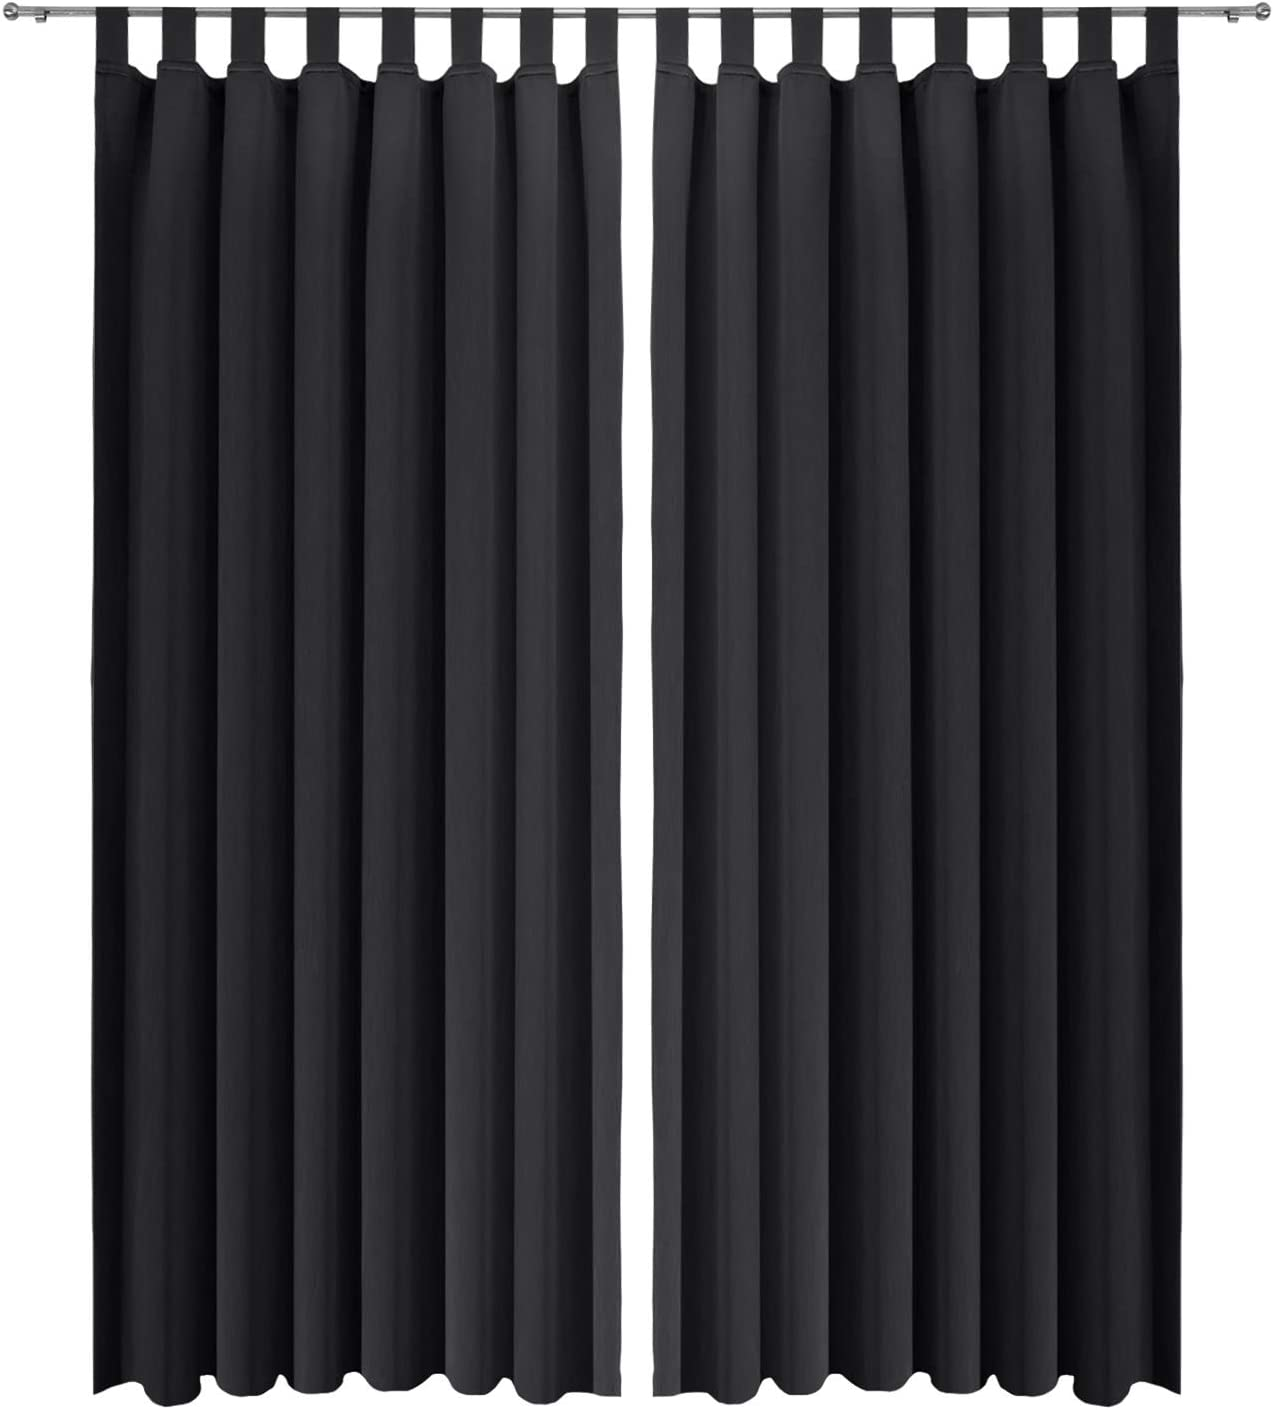 con Passanti Verde Oscurante per balconi e finestre 2 unit/à da 140x245 cm Beautissu Tende oscuranti Amelie BS